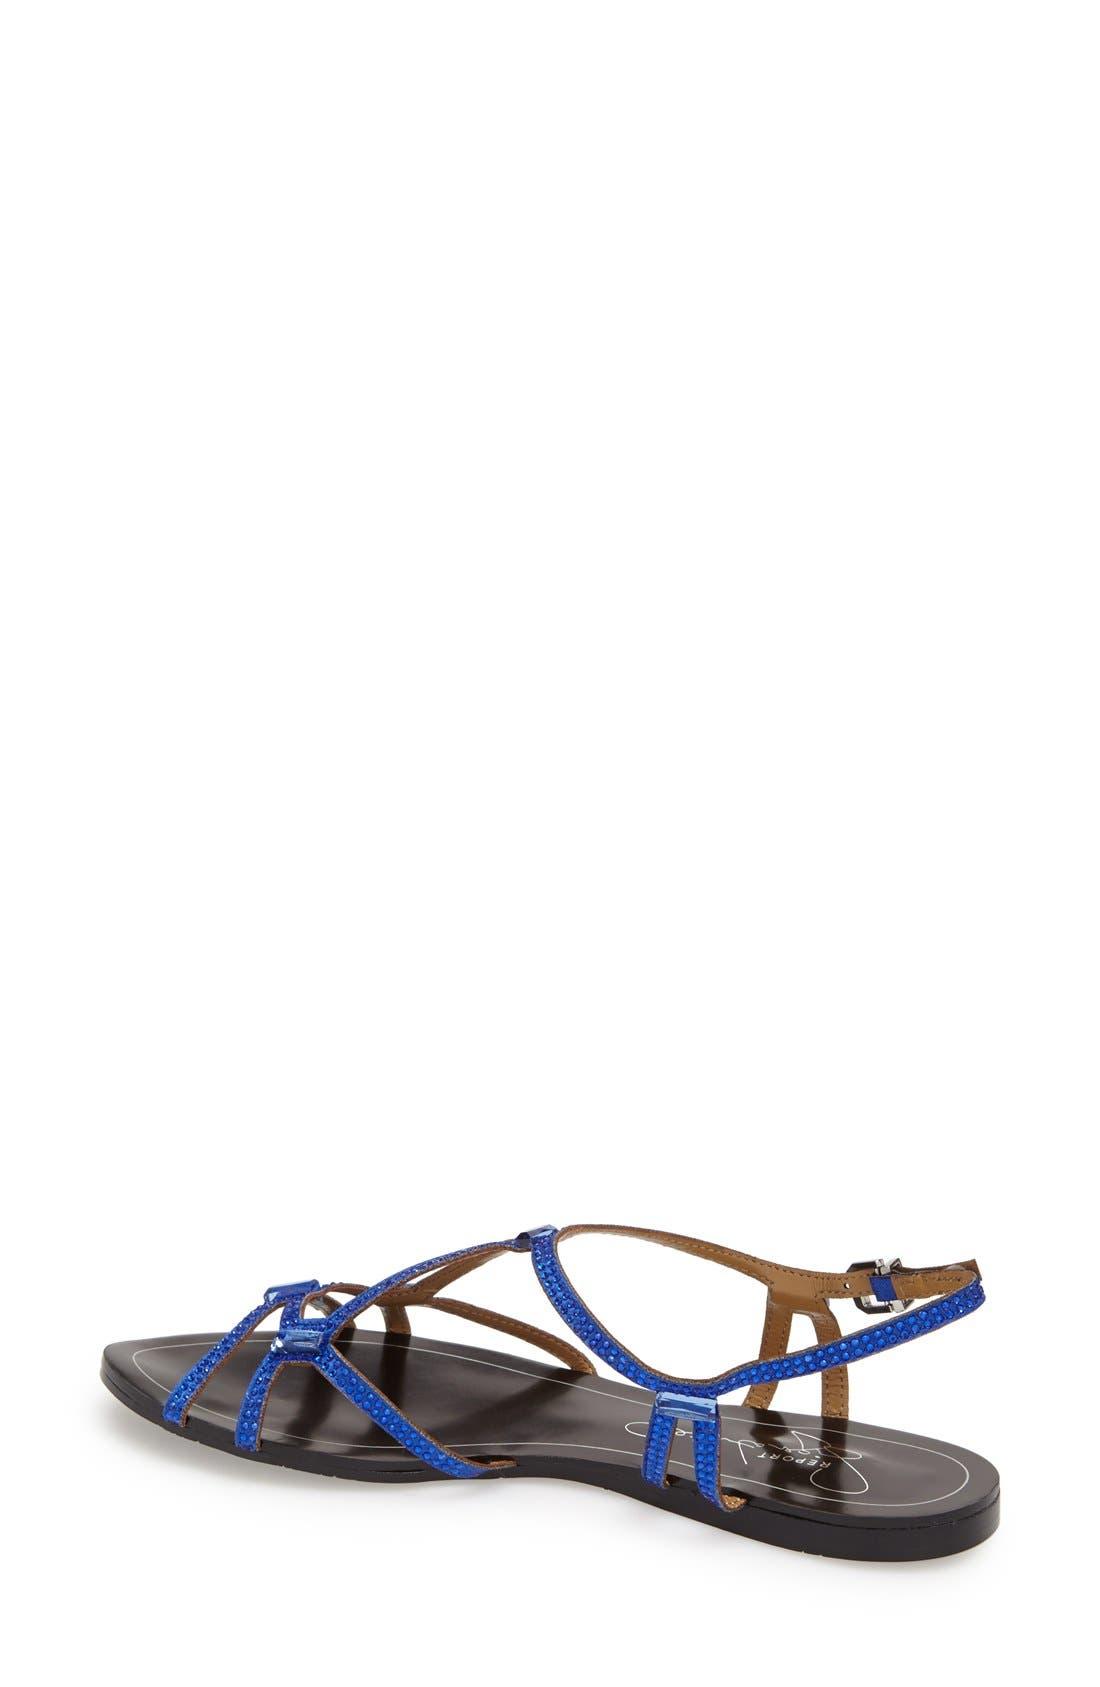 Alternate Image 4  - REPORT Signature 'Sarasota' Crystal Embellished Sandal (Women)